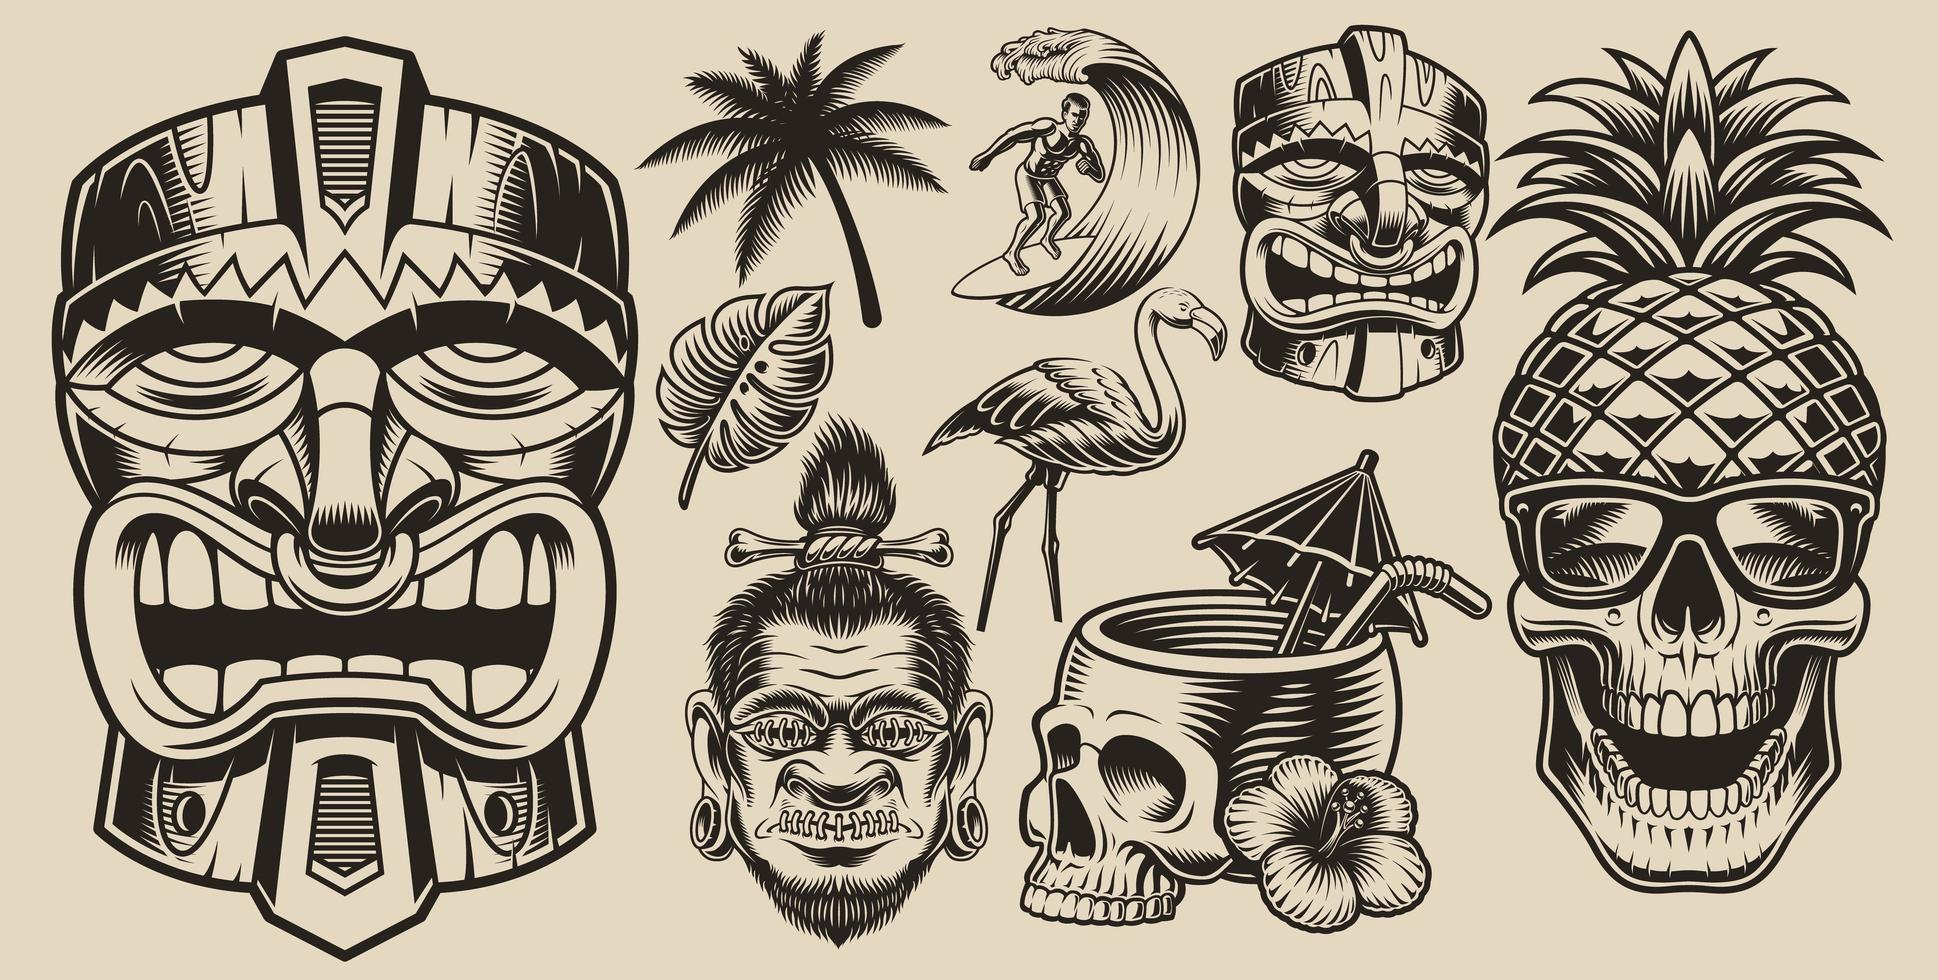 Surfing, Hawai, vacation elements set vector